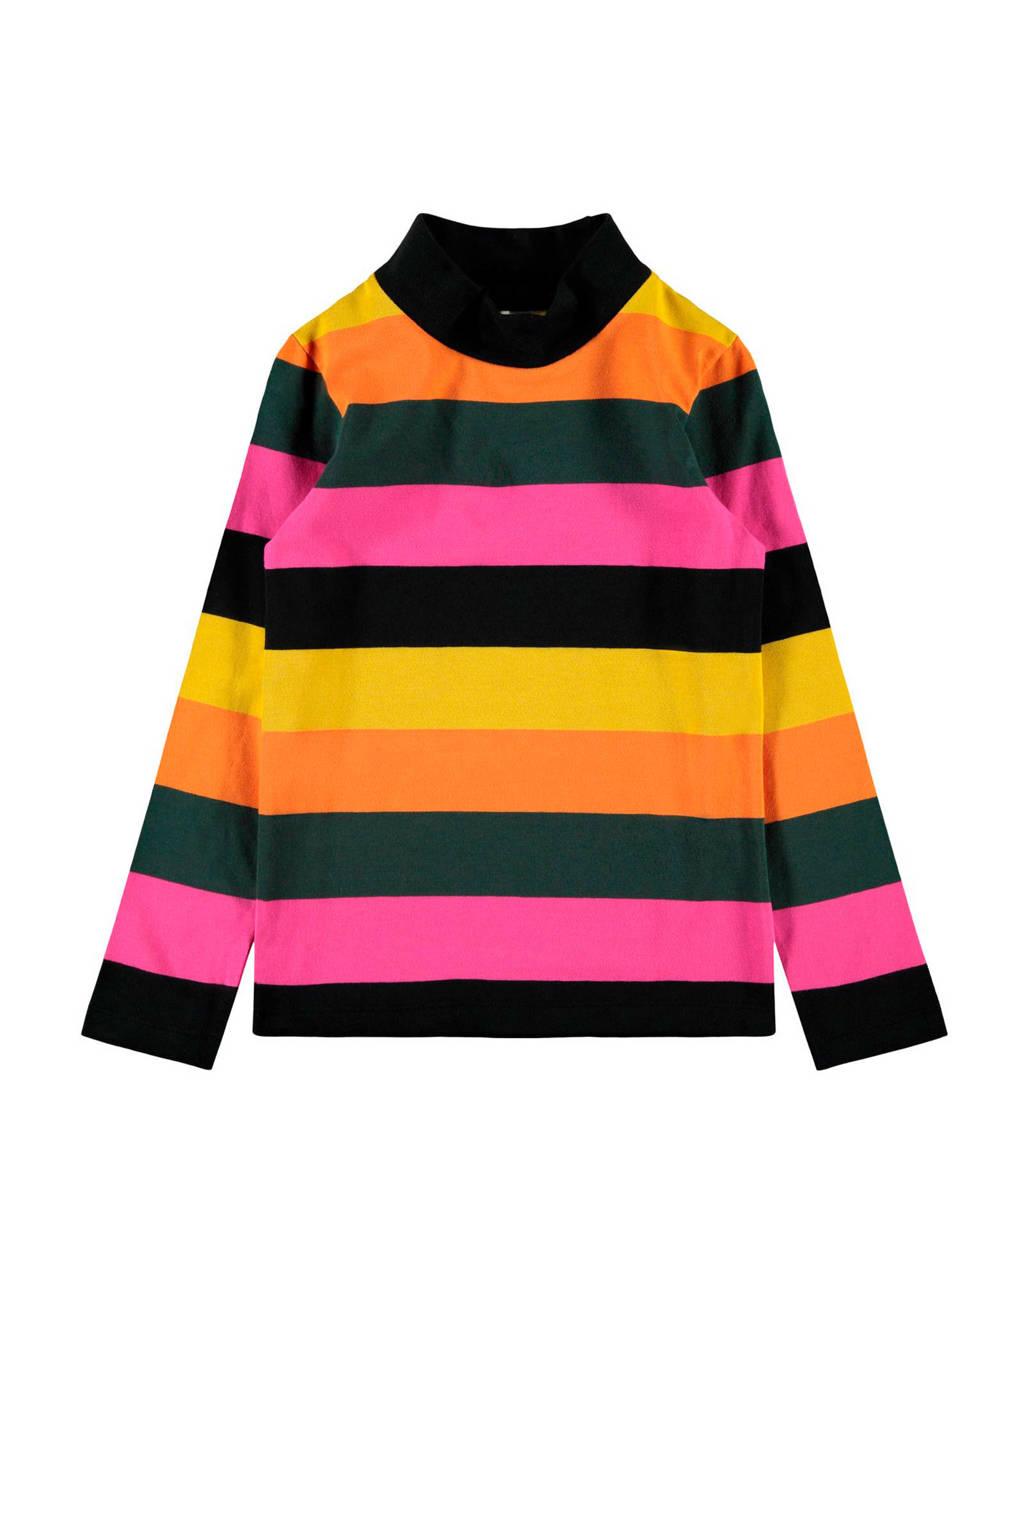 NAME IT KIDS gestreepte longsleeve Nira roze/zwart/oranje, Roze/zwart/oranje